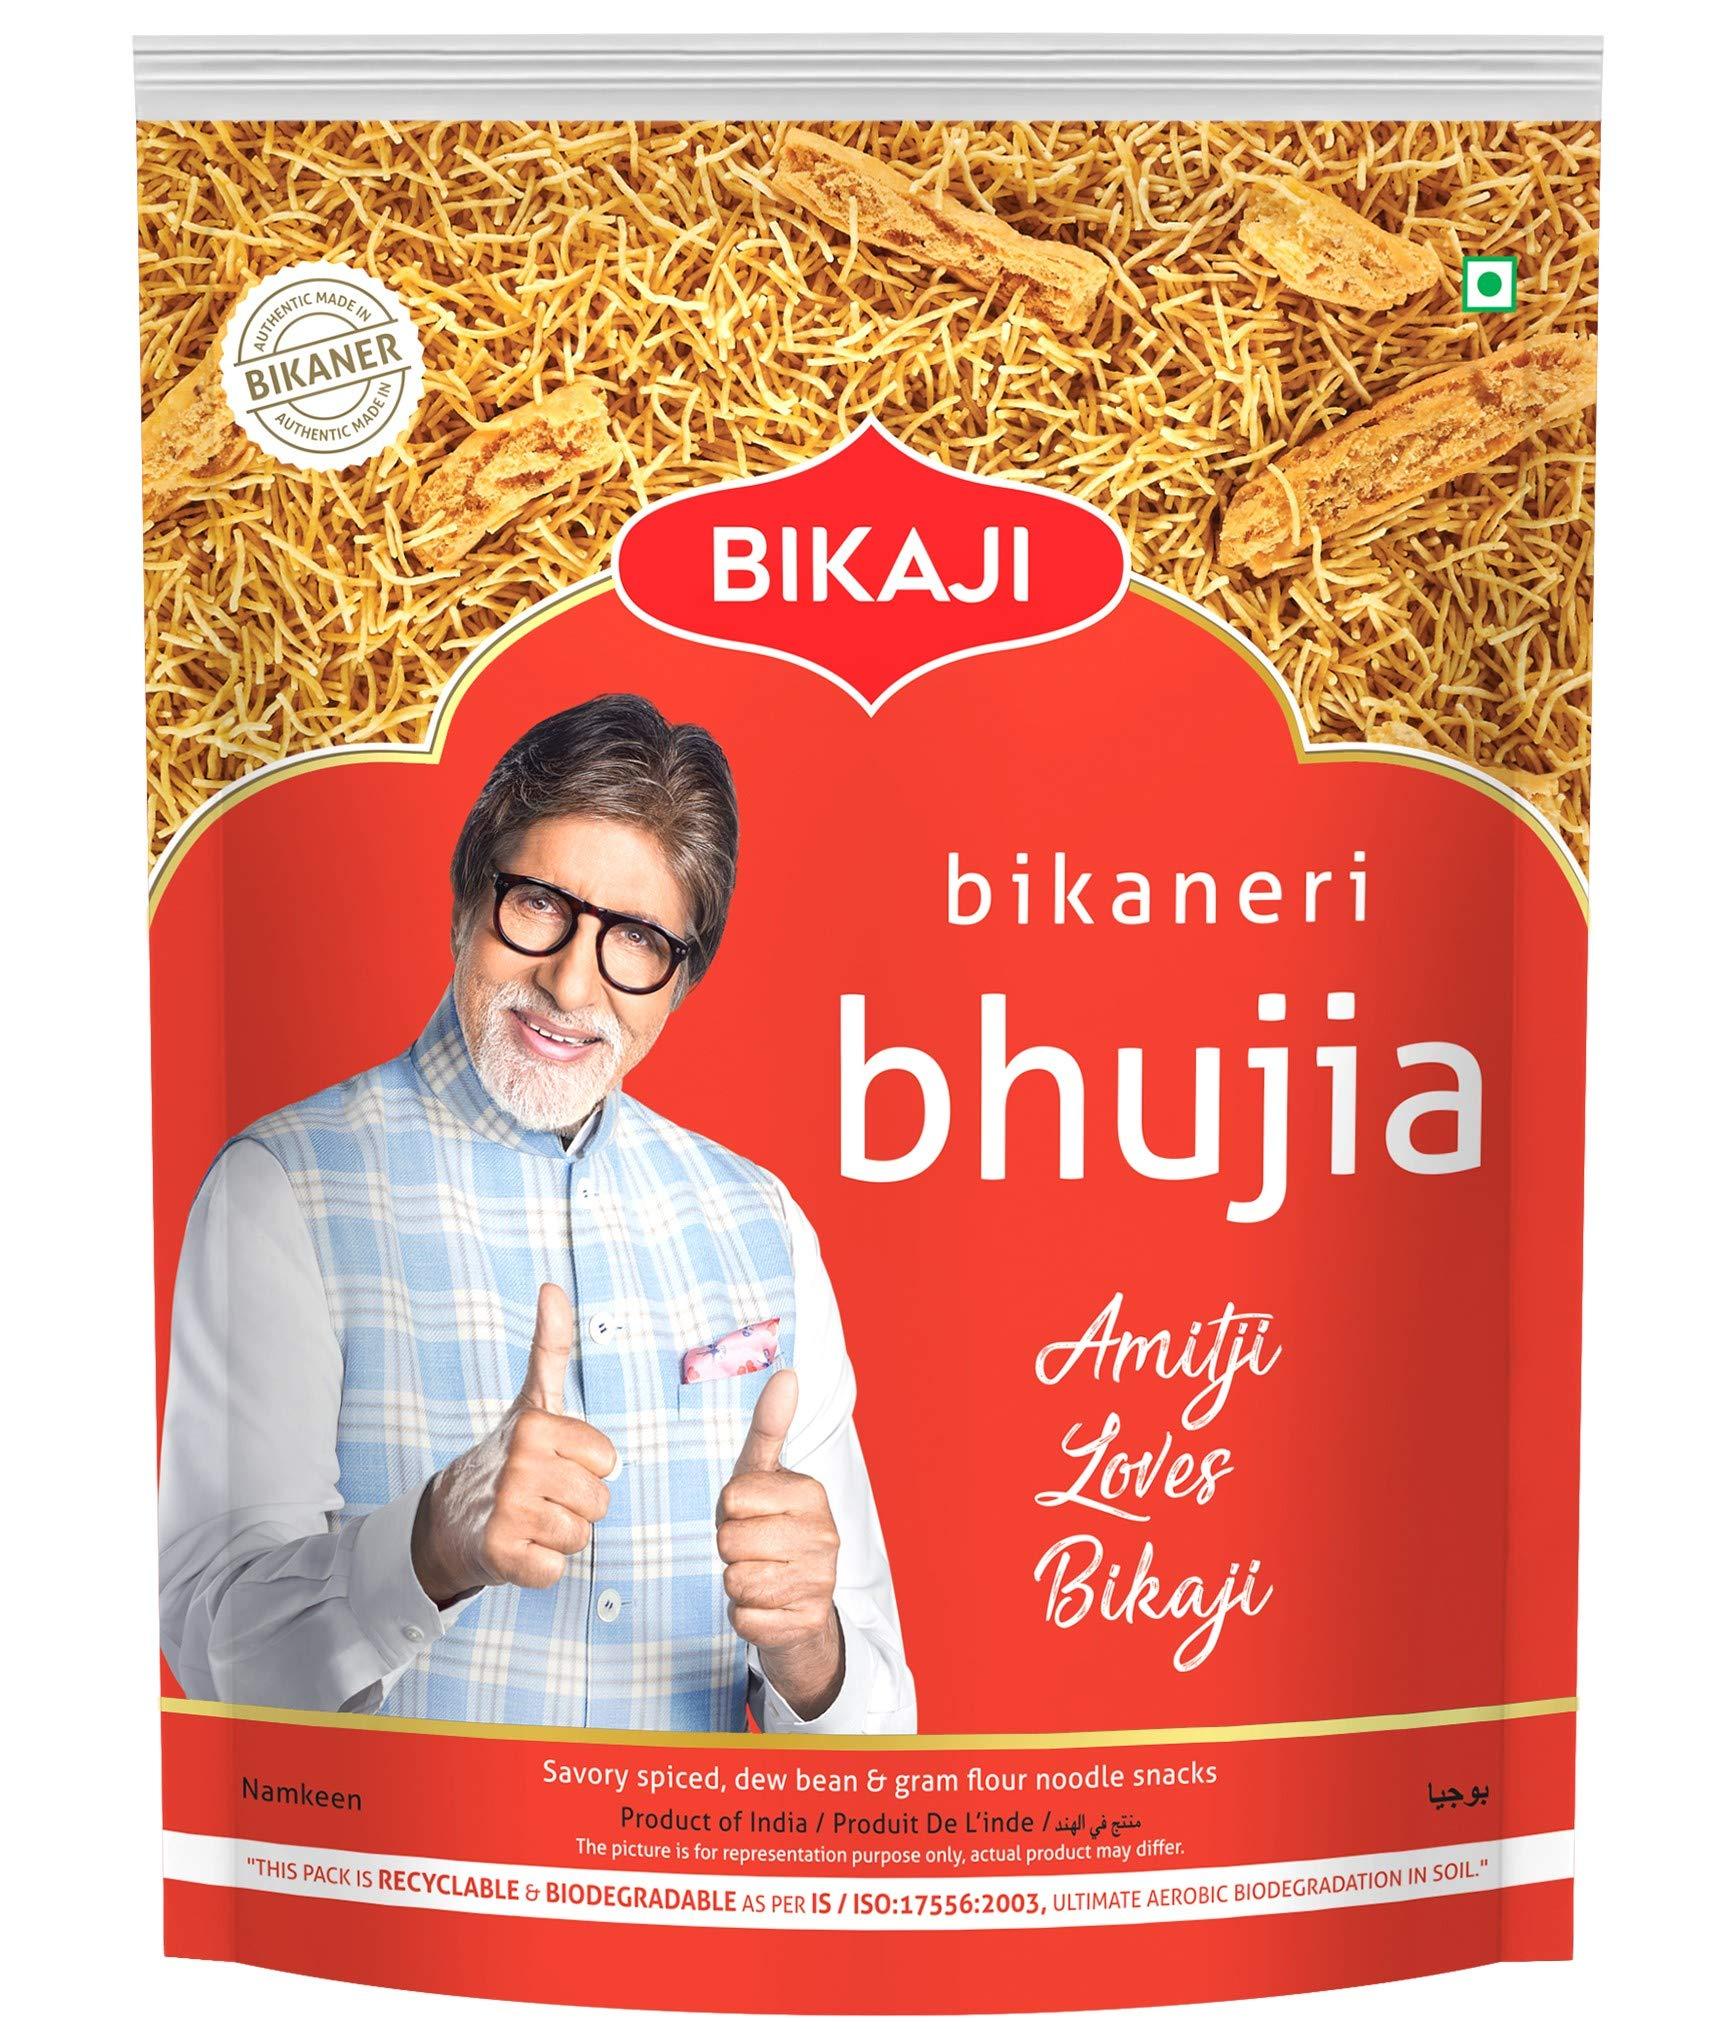 Bikaji Aslee Bikaneri Vegetarian Indian Namkeen Snack Spicy Sev (1 Kg)